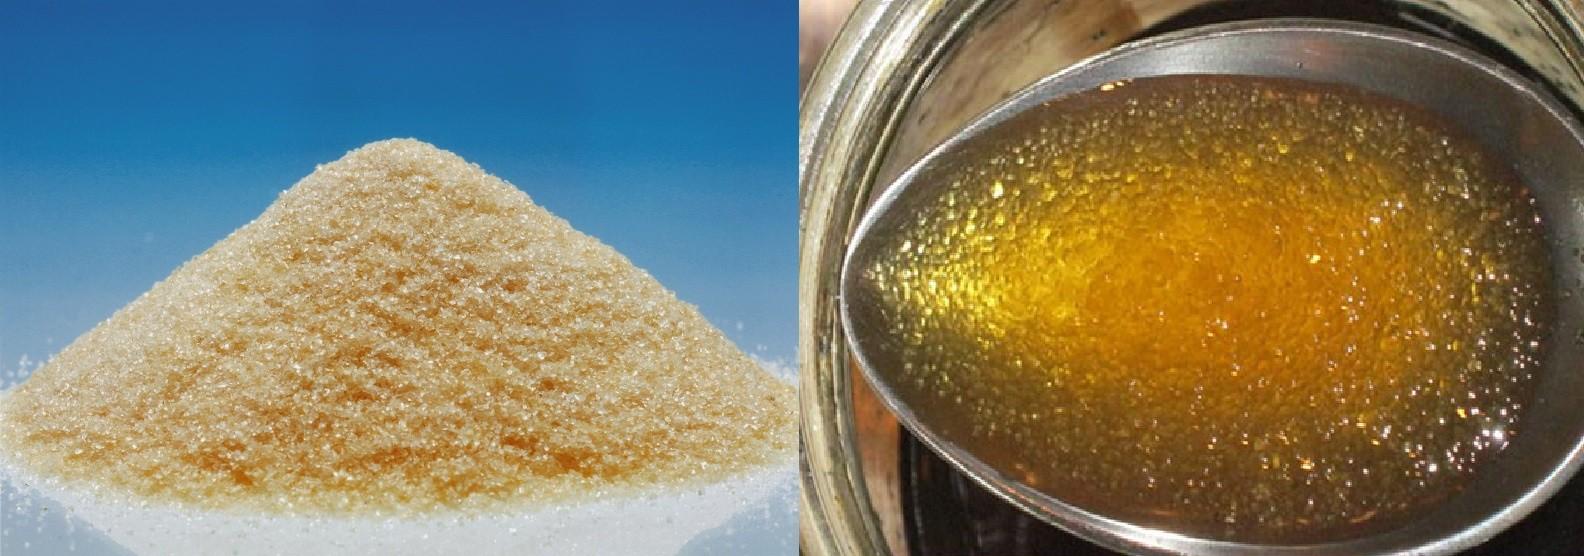 Домашний желатин польза и вред